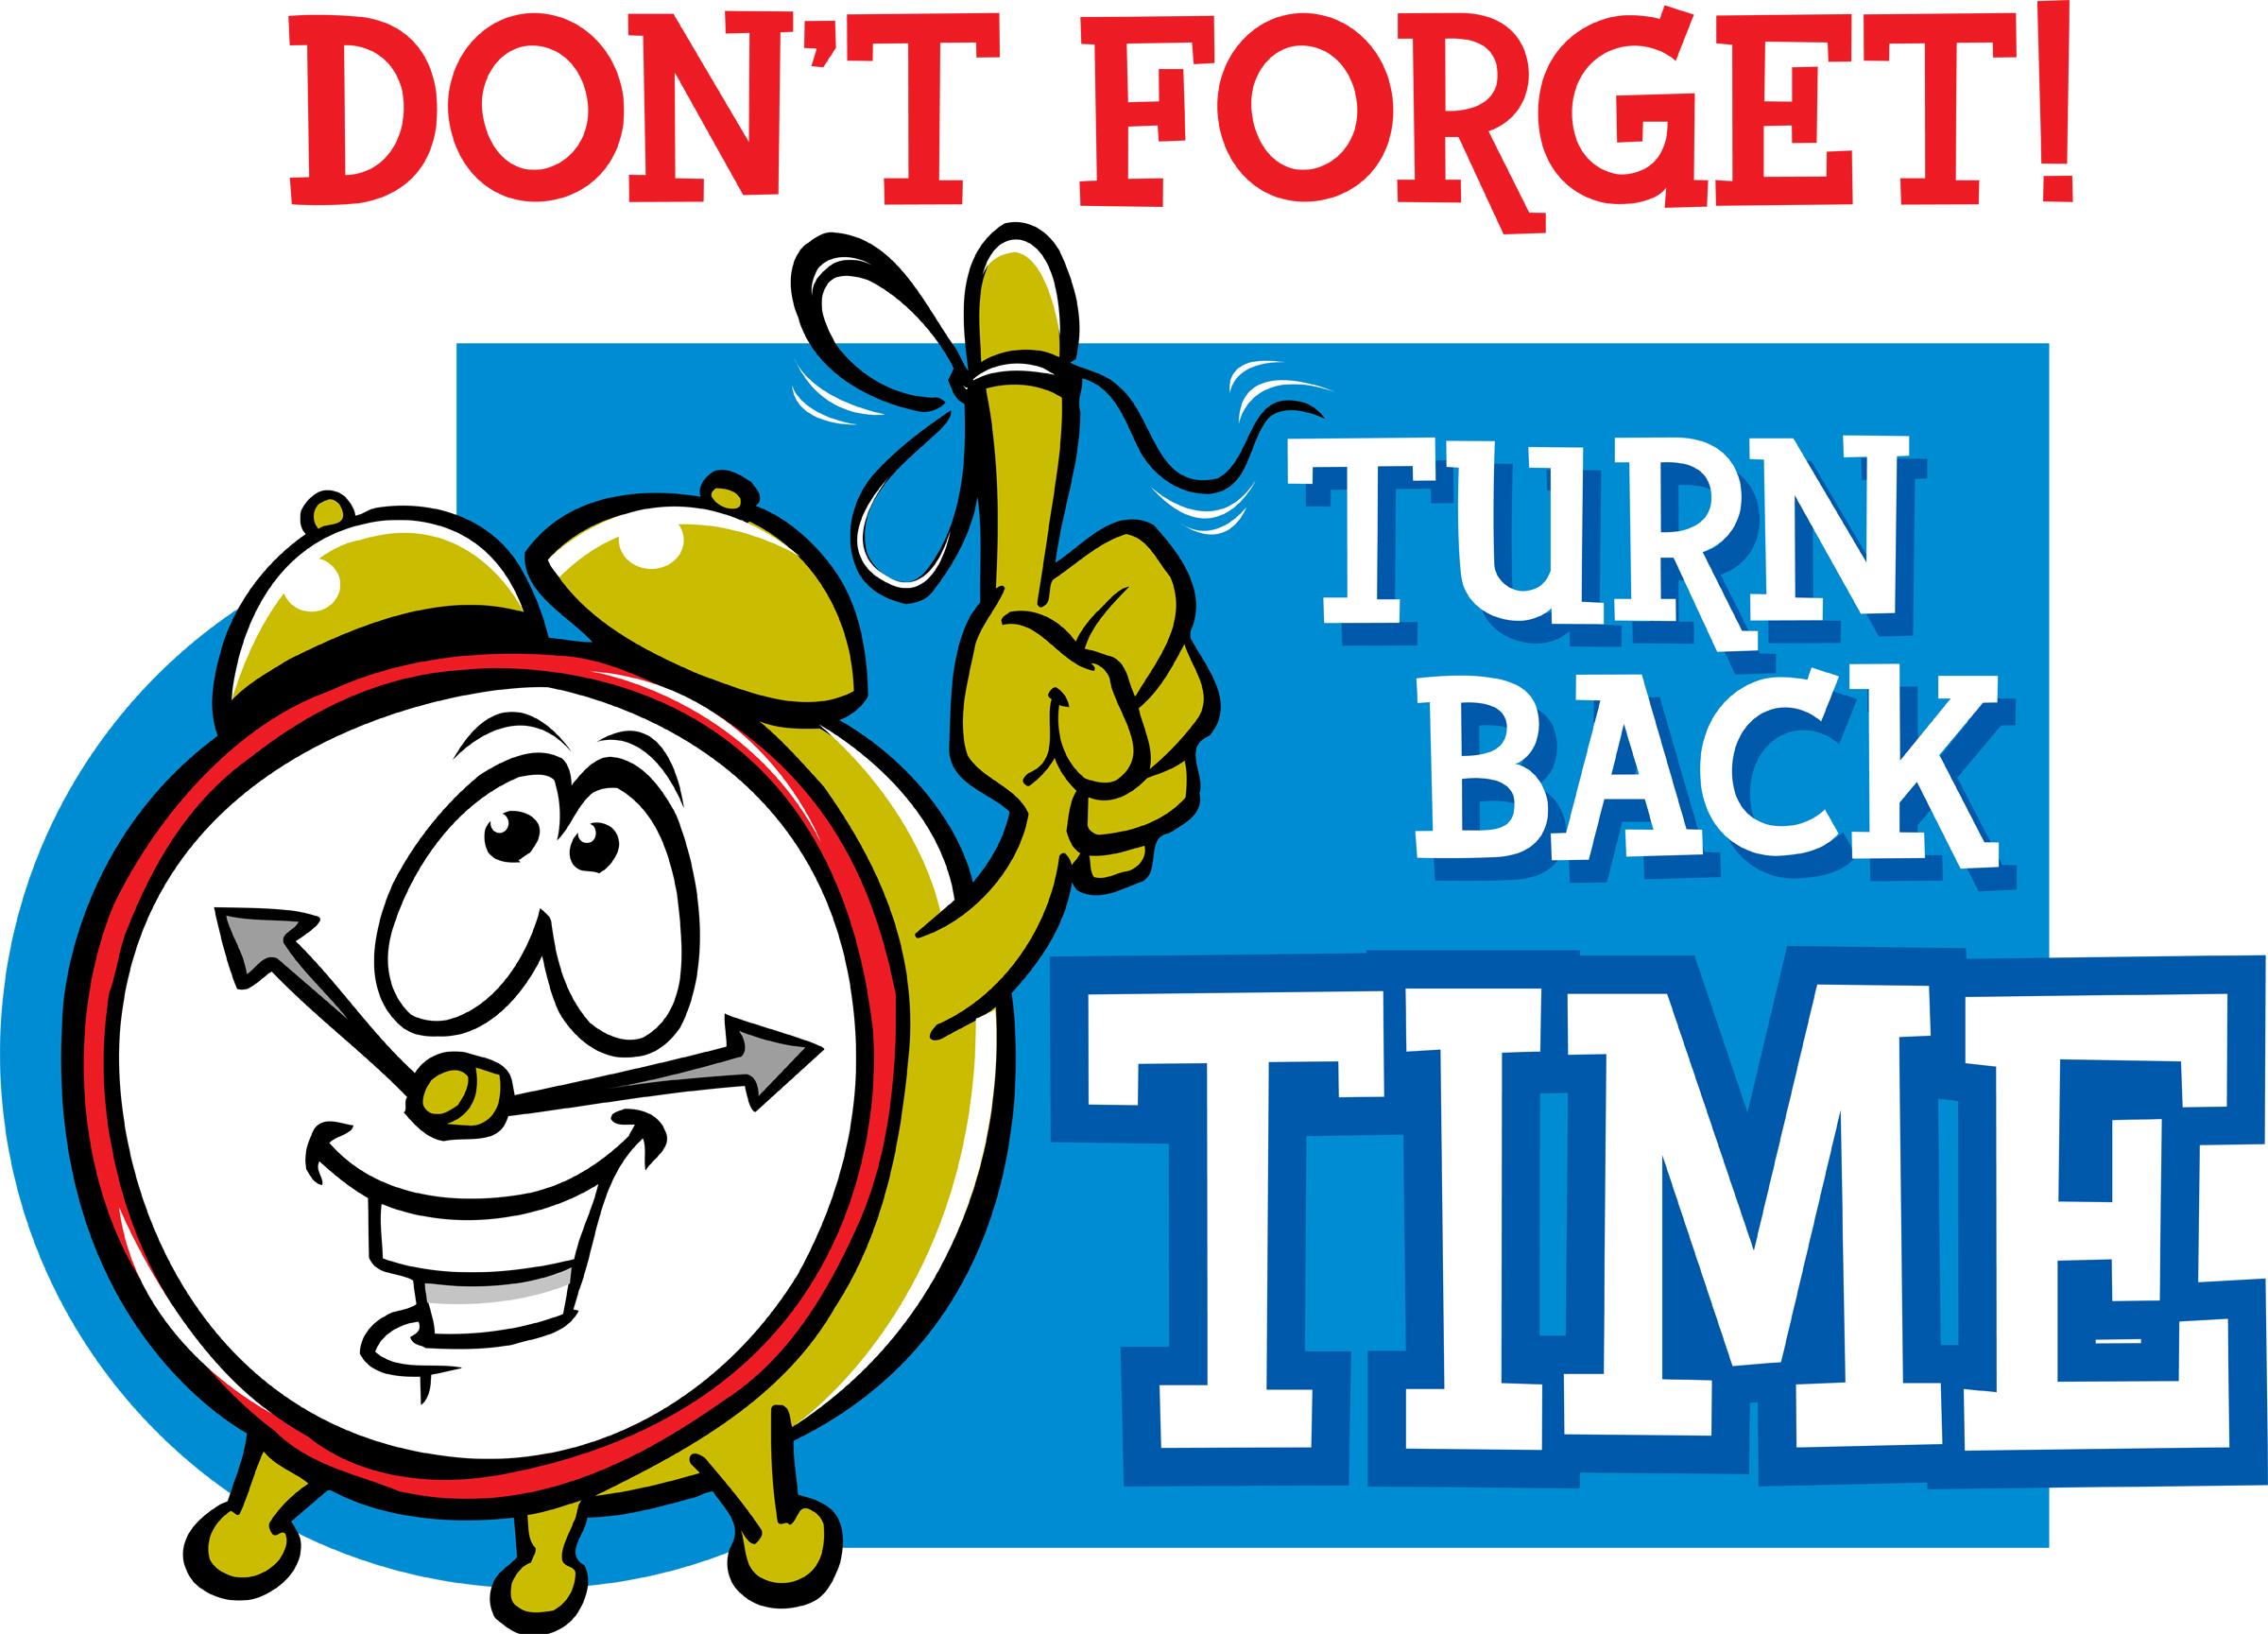 2015 october hope united methodist church Spring Begins Clip Art Daylight Savings Time Begins